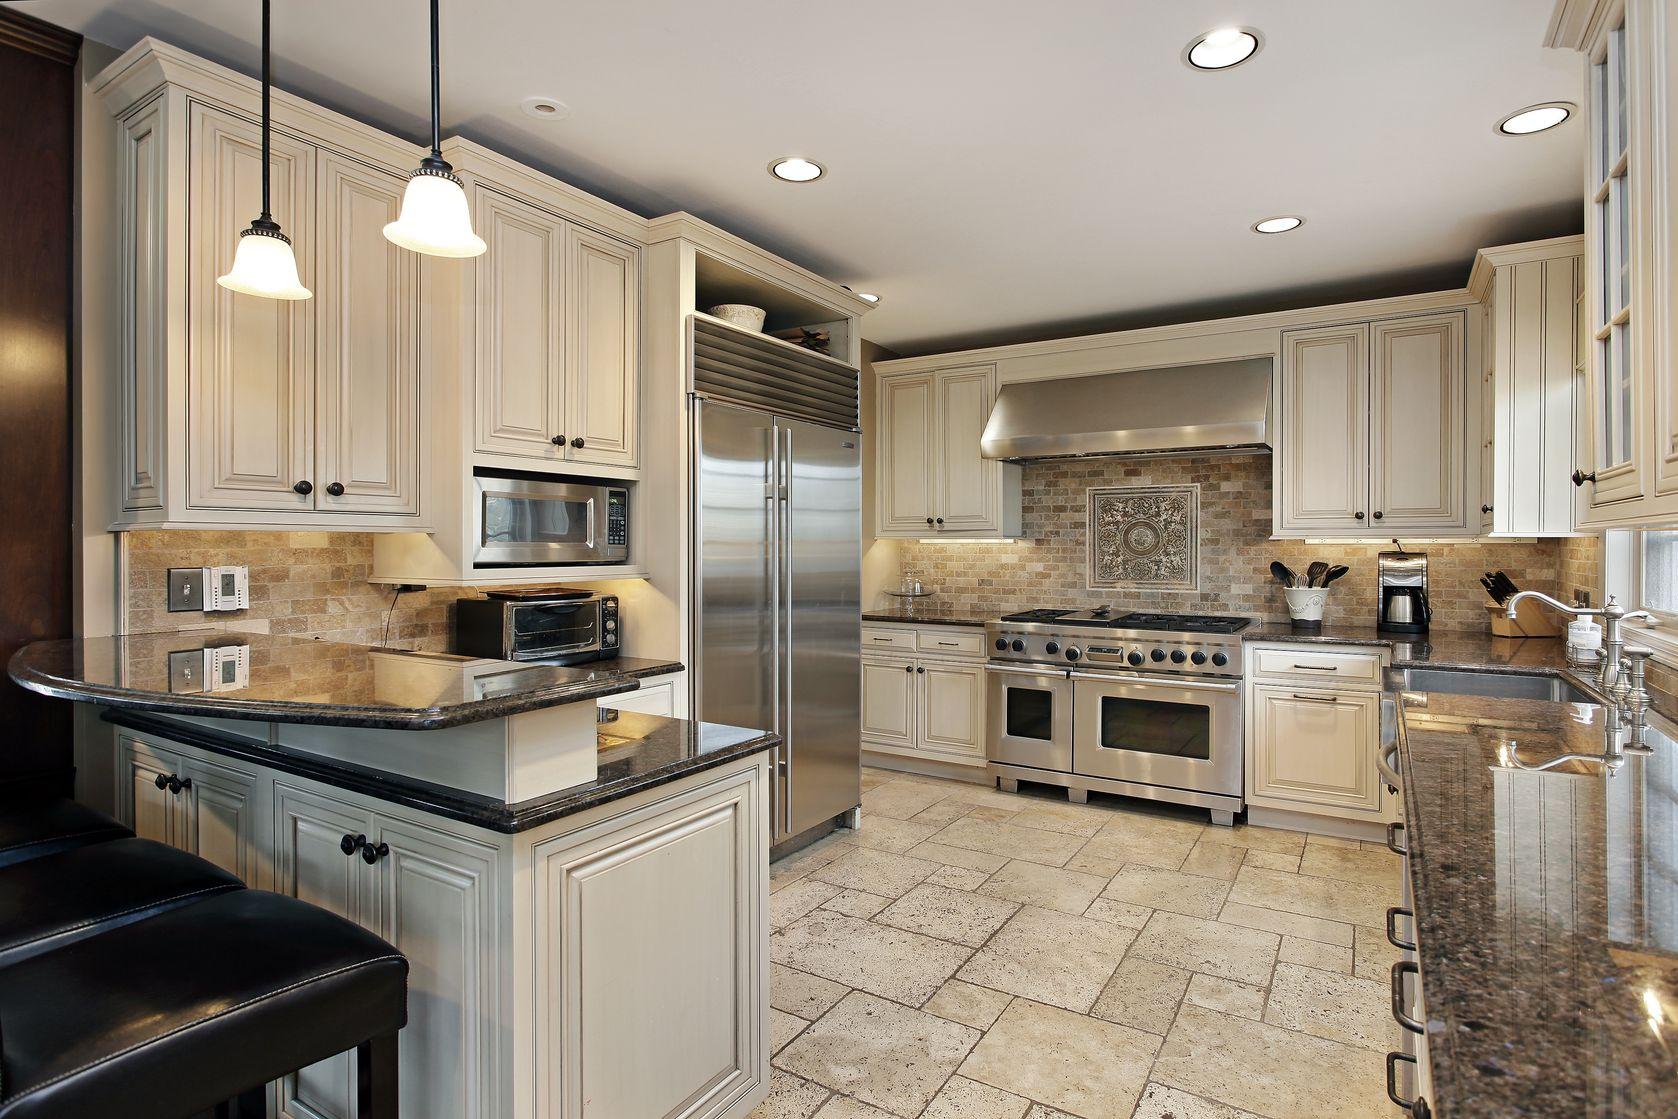 Cabinet Refacing Maryland | Kitchen & Bathroom Cabinet ... on Kitchen  id=41152